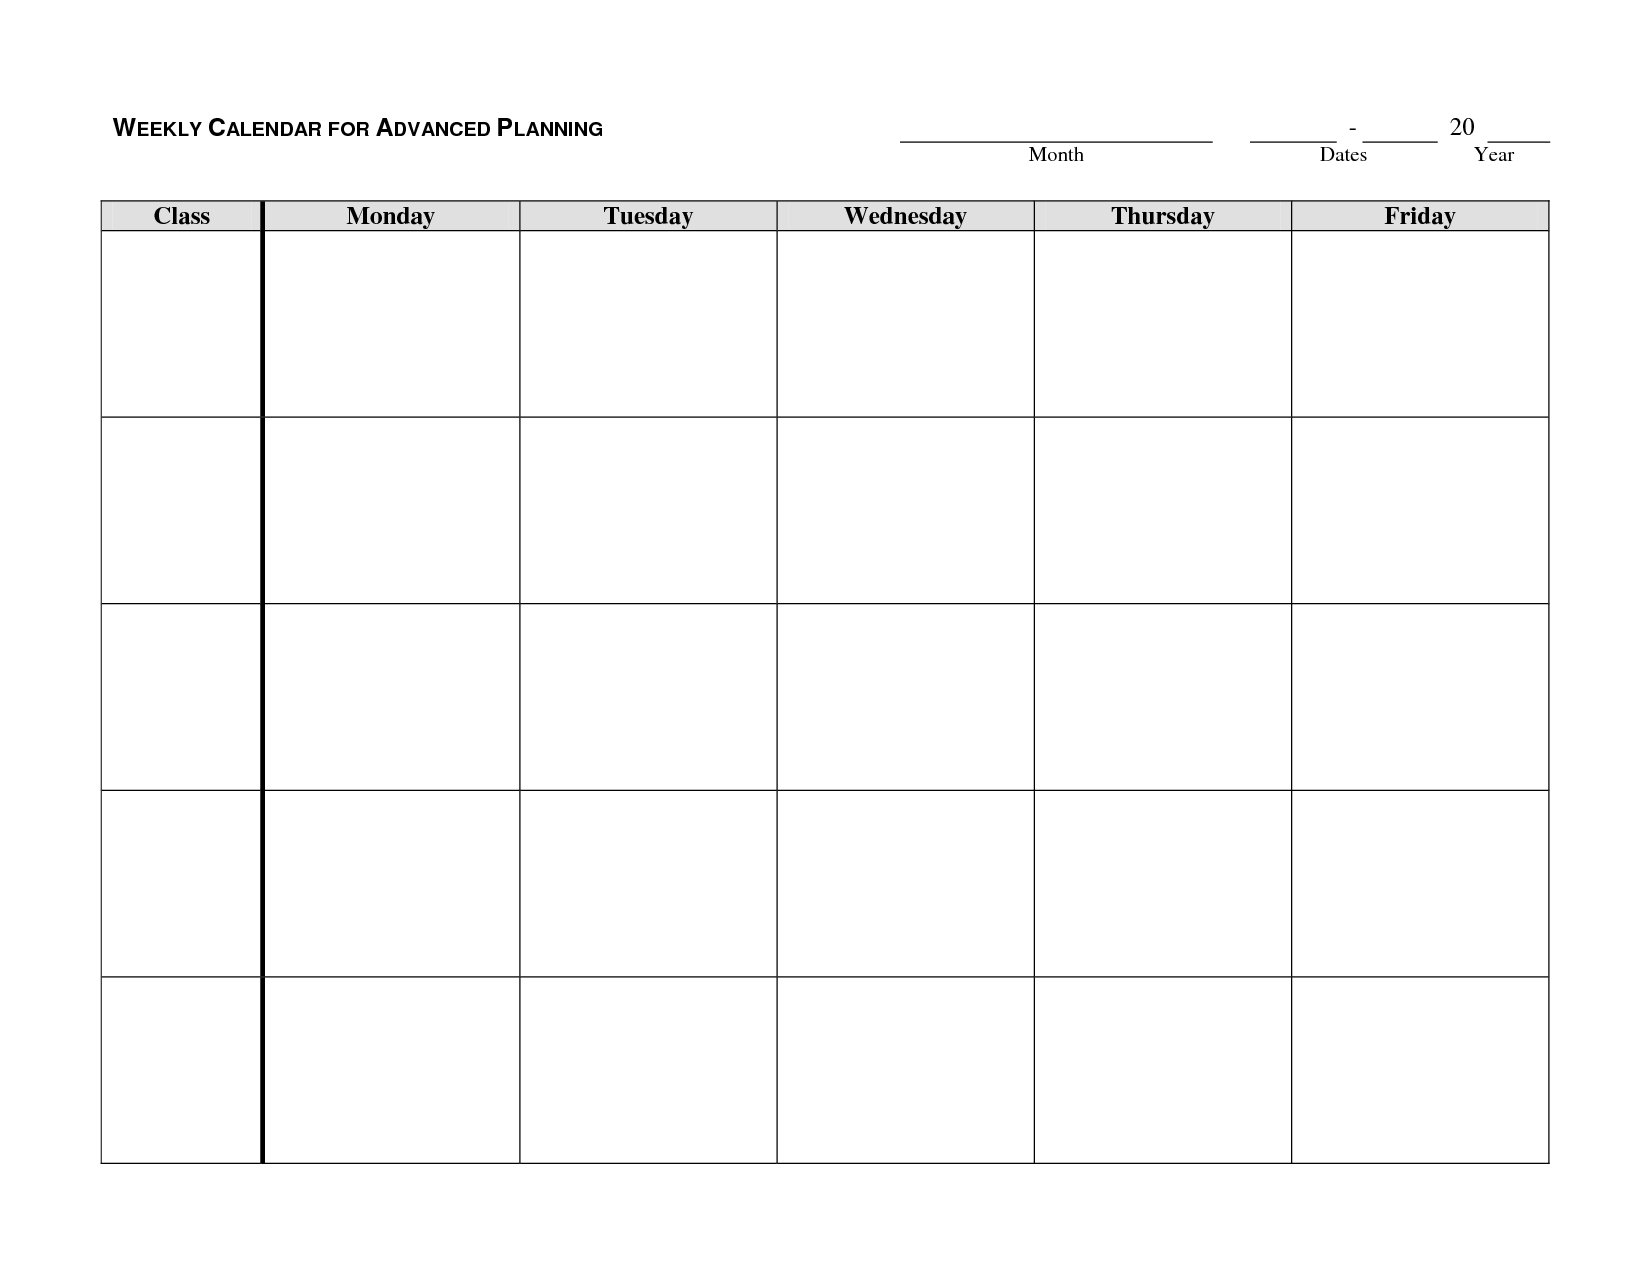 Weekly Planner Template Monday Thru Friday :-Free Calendar Template with Printable Calendar Weekly Mon - Fri Graphics